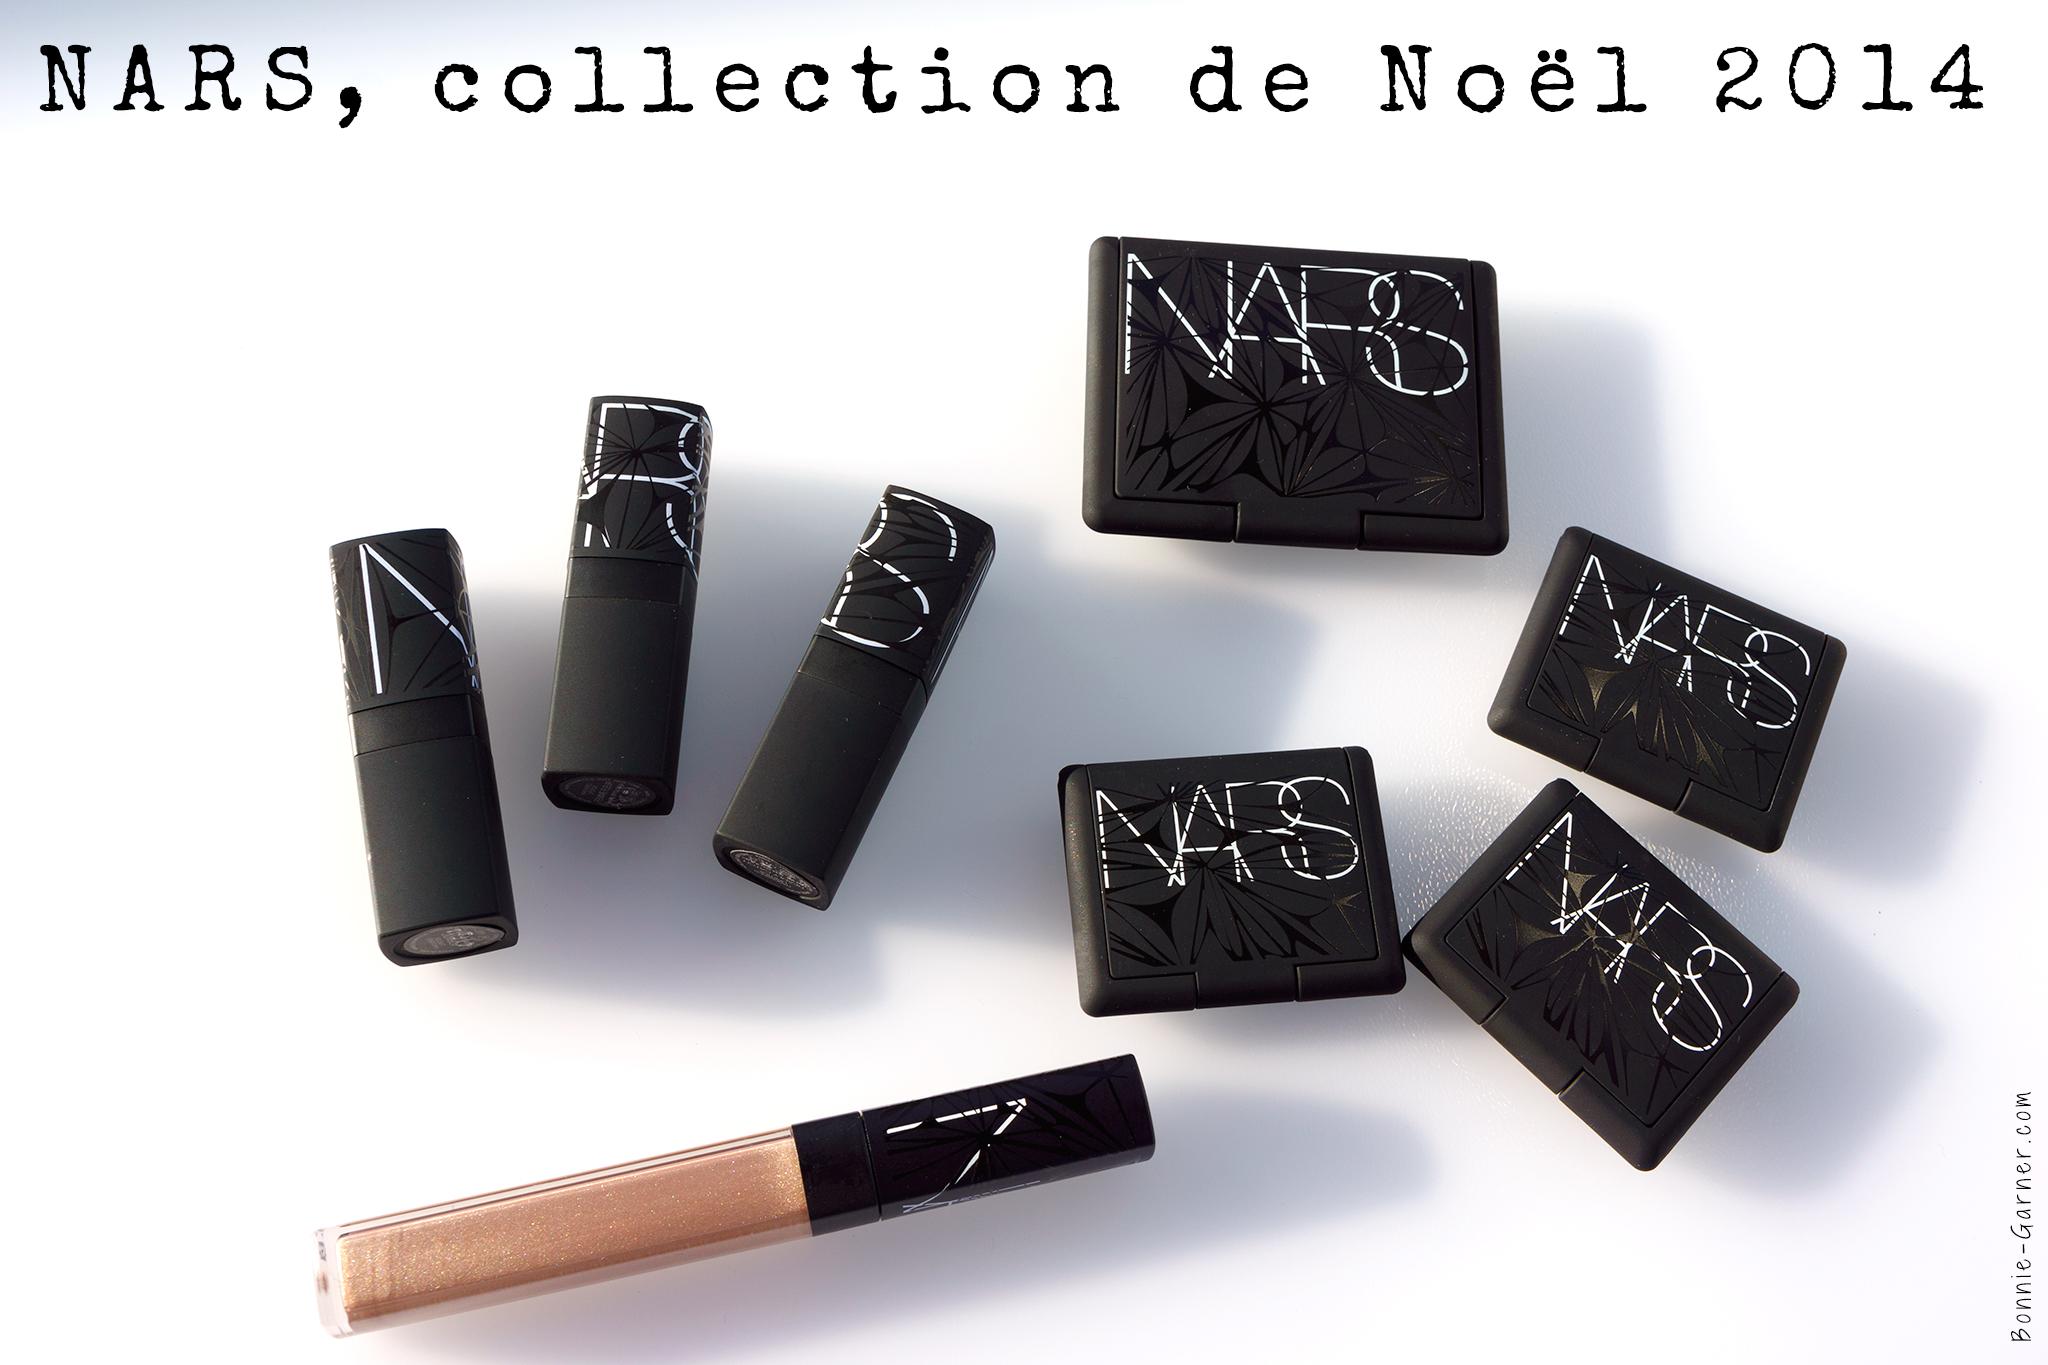 NARS collection de Noël 2014